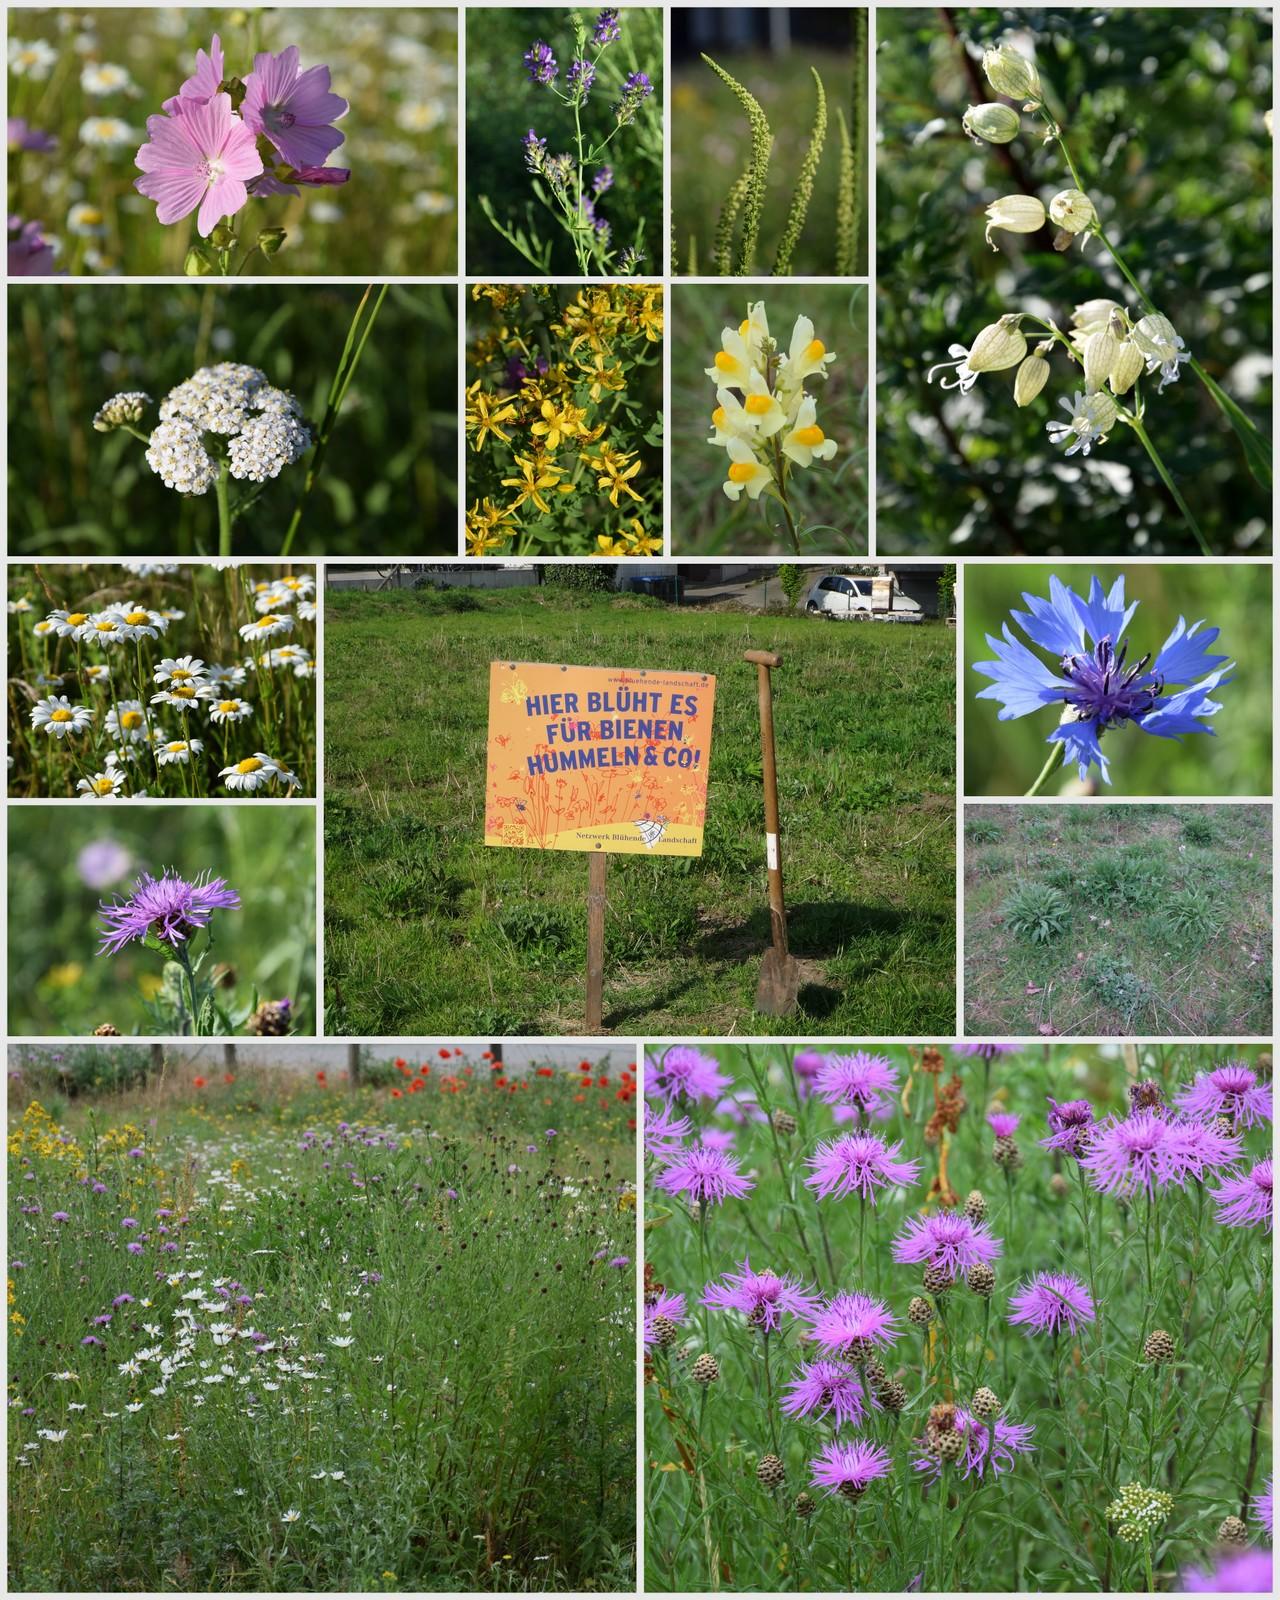 Bienenweide Archive Der Bienenblog